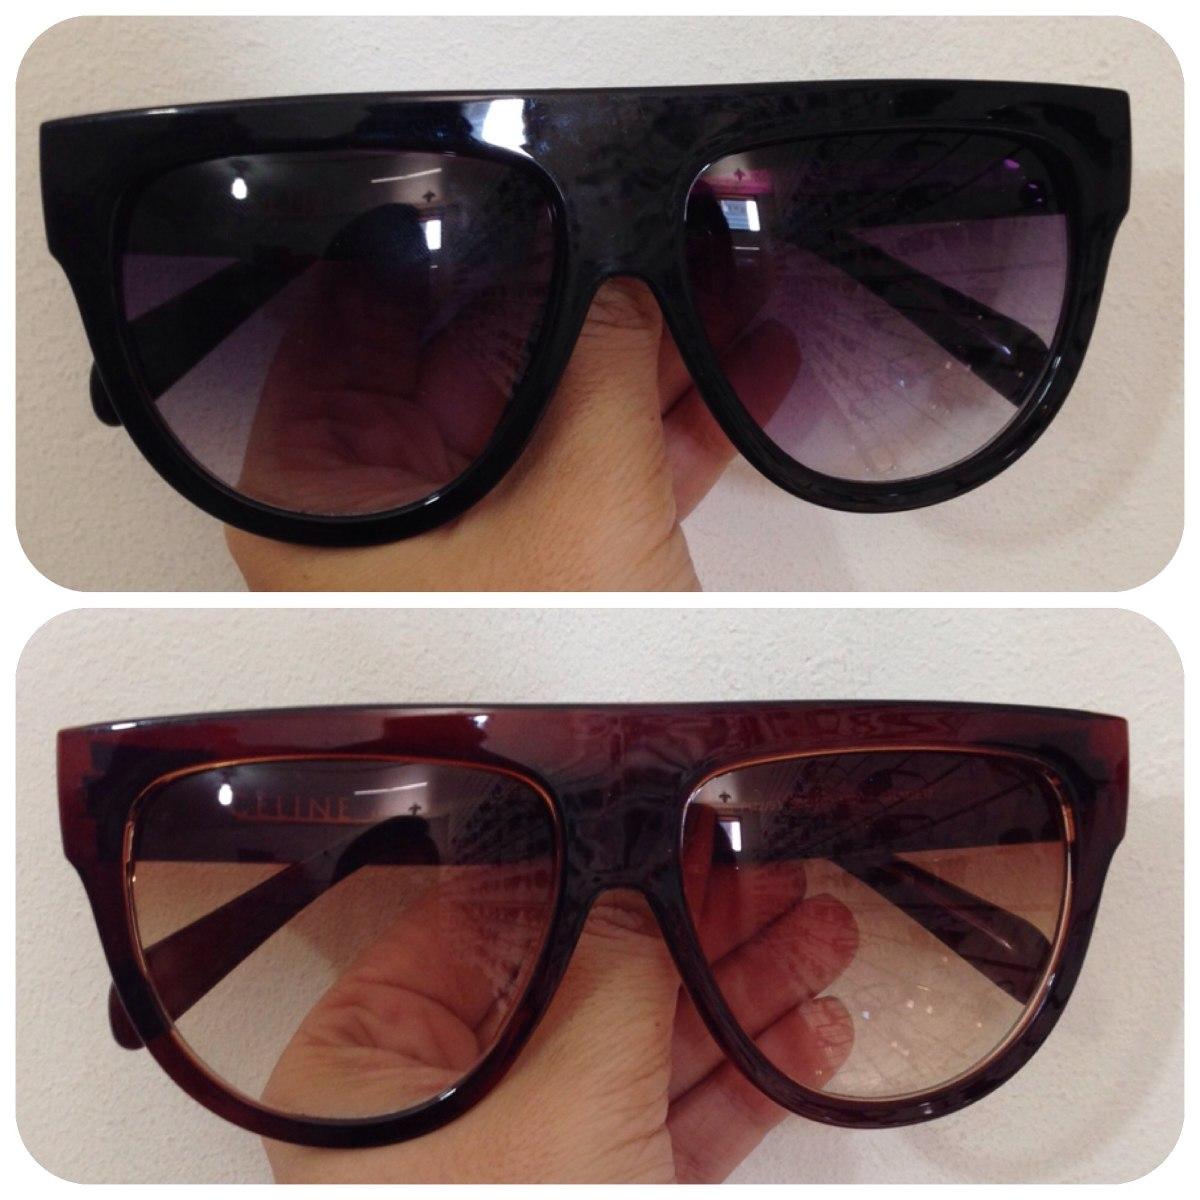 09cc676d4c057 óculos celine oversized shadow vintage quadrado degradê. Carregando zoom.